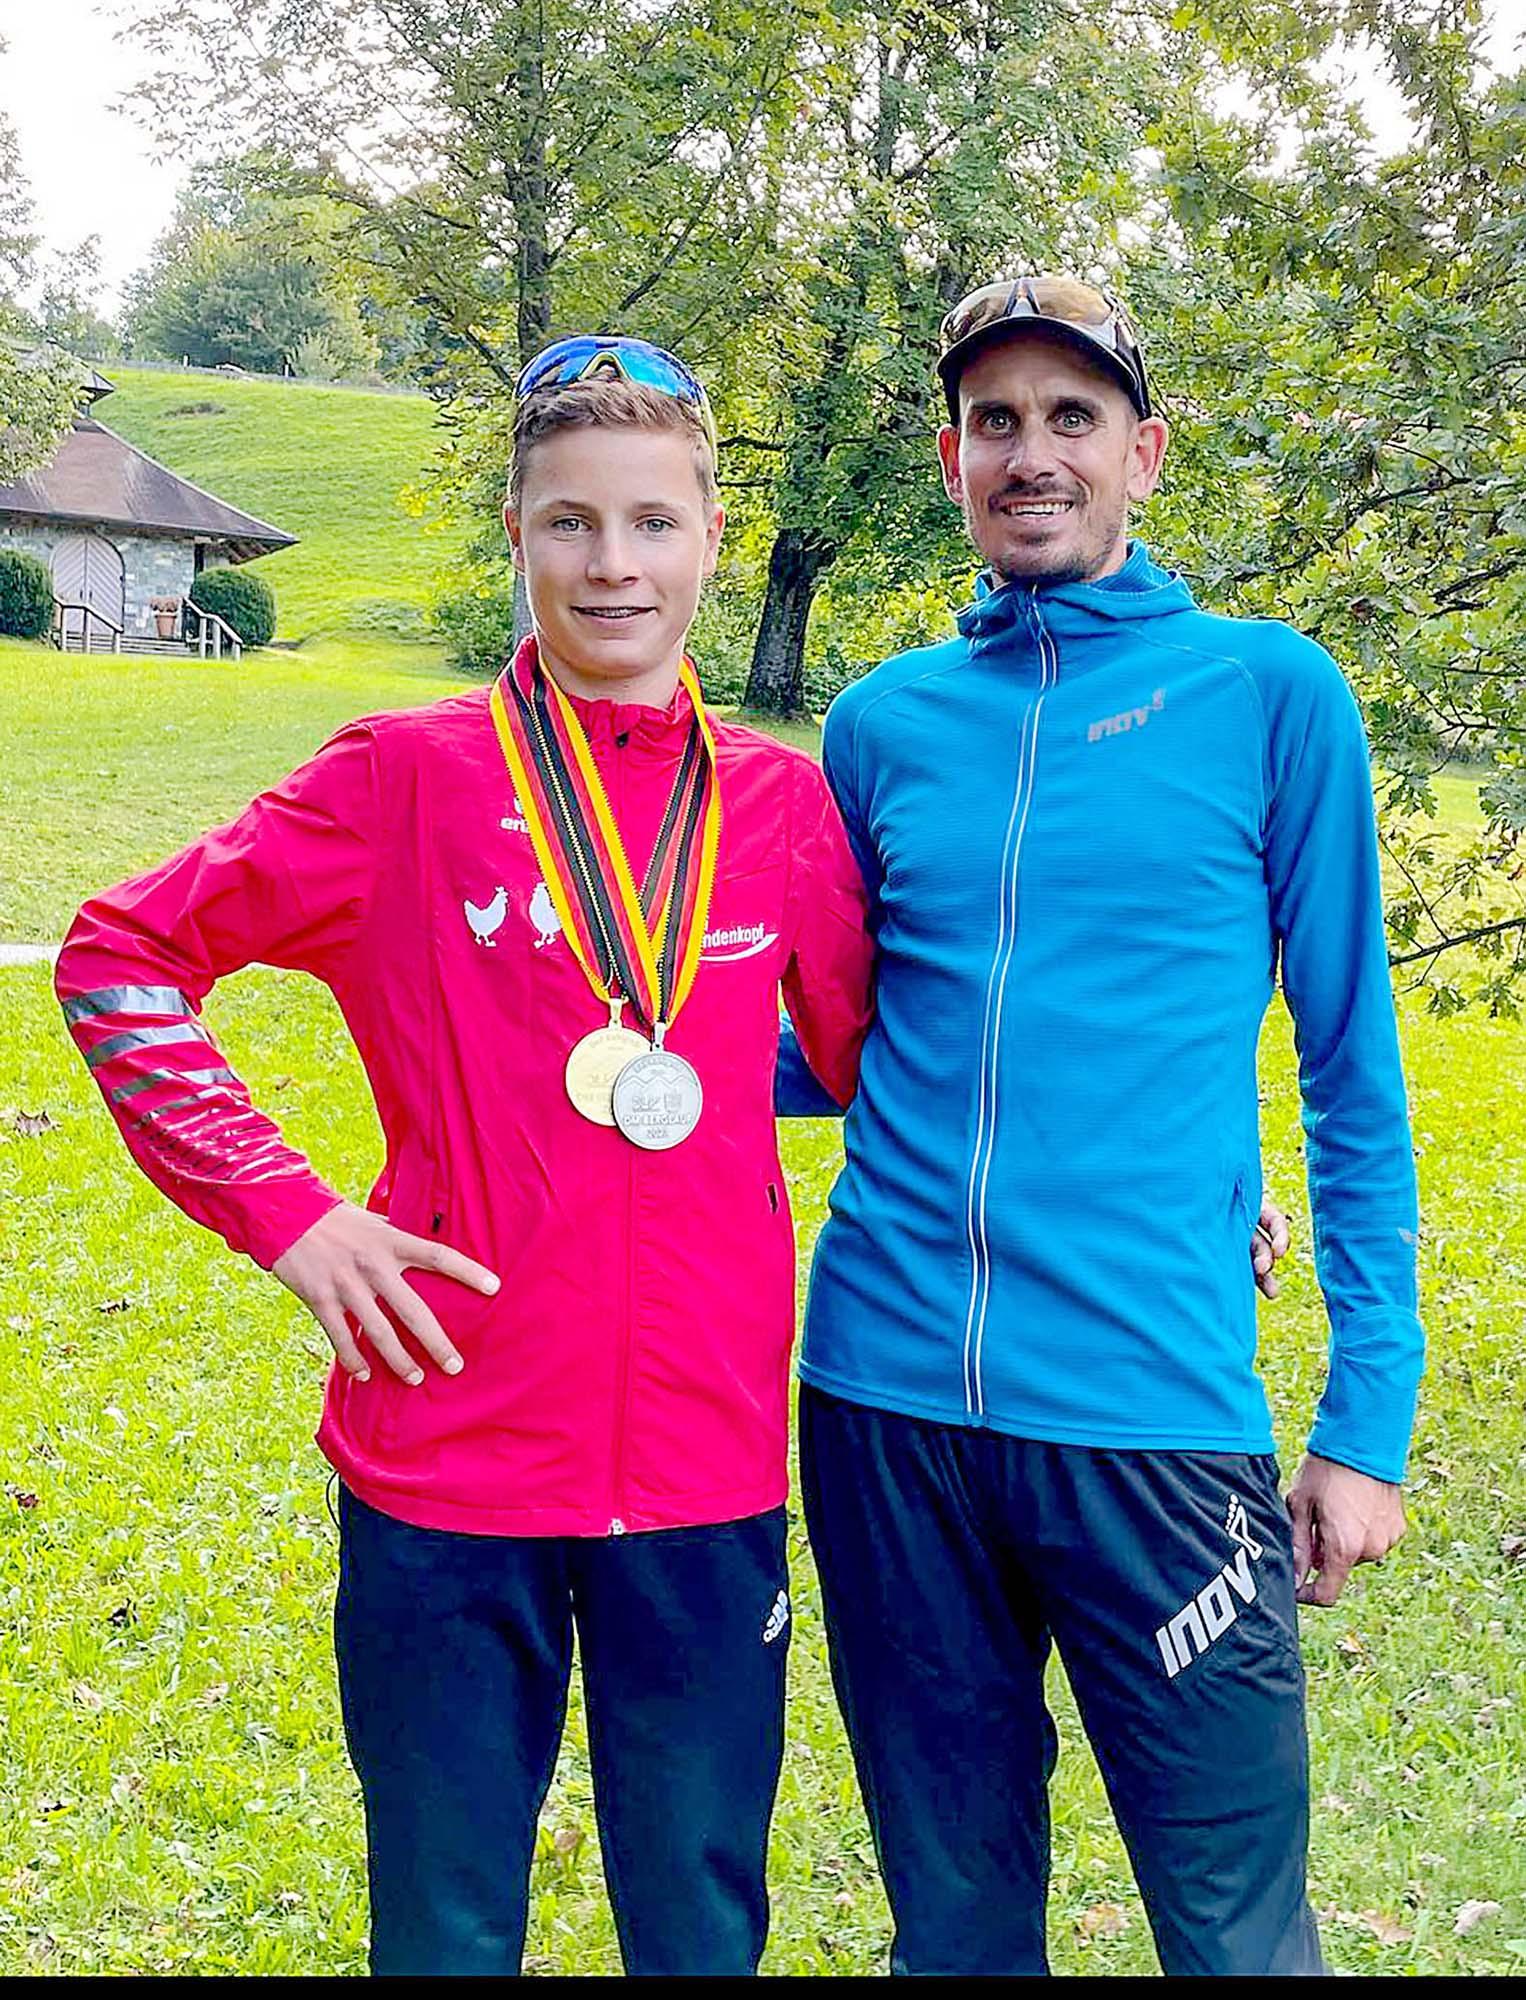 2021-9-22-ZE-as-Deutsche Berglaufmeisterschaften-LukasEhrle_TrainerTimoZeiler